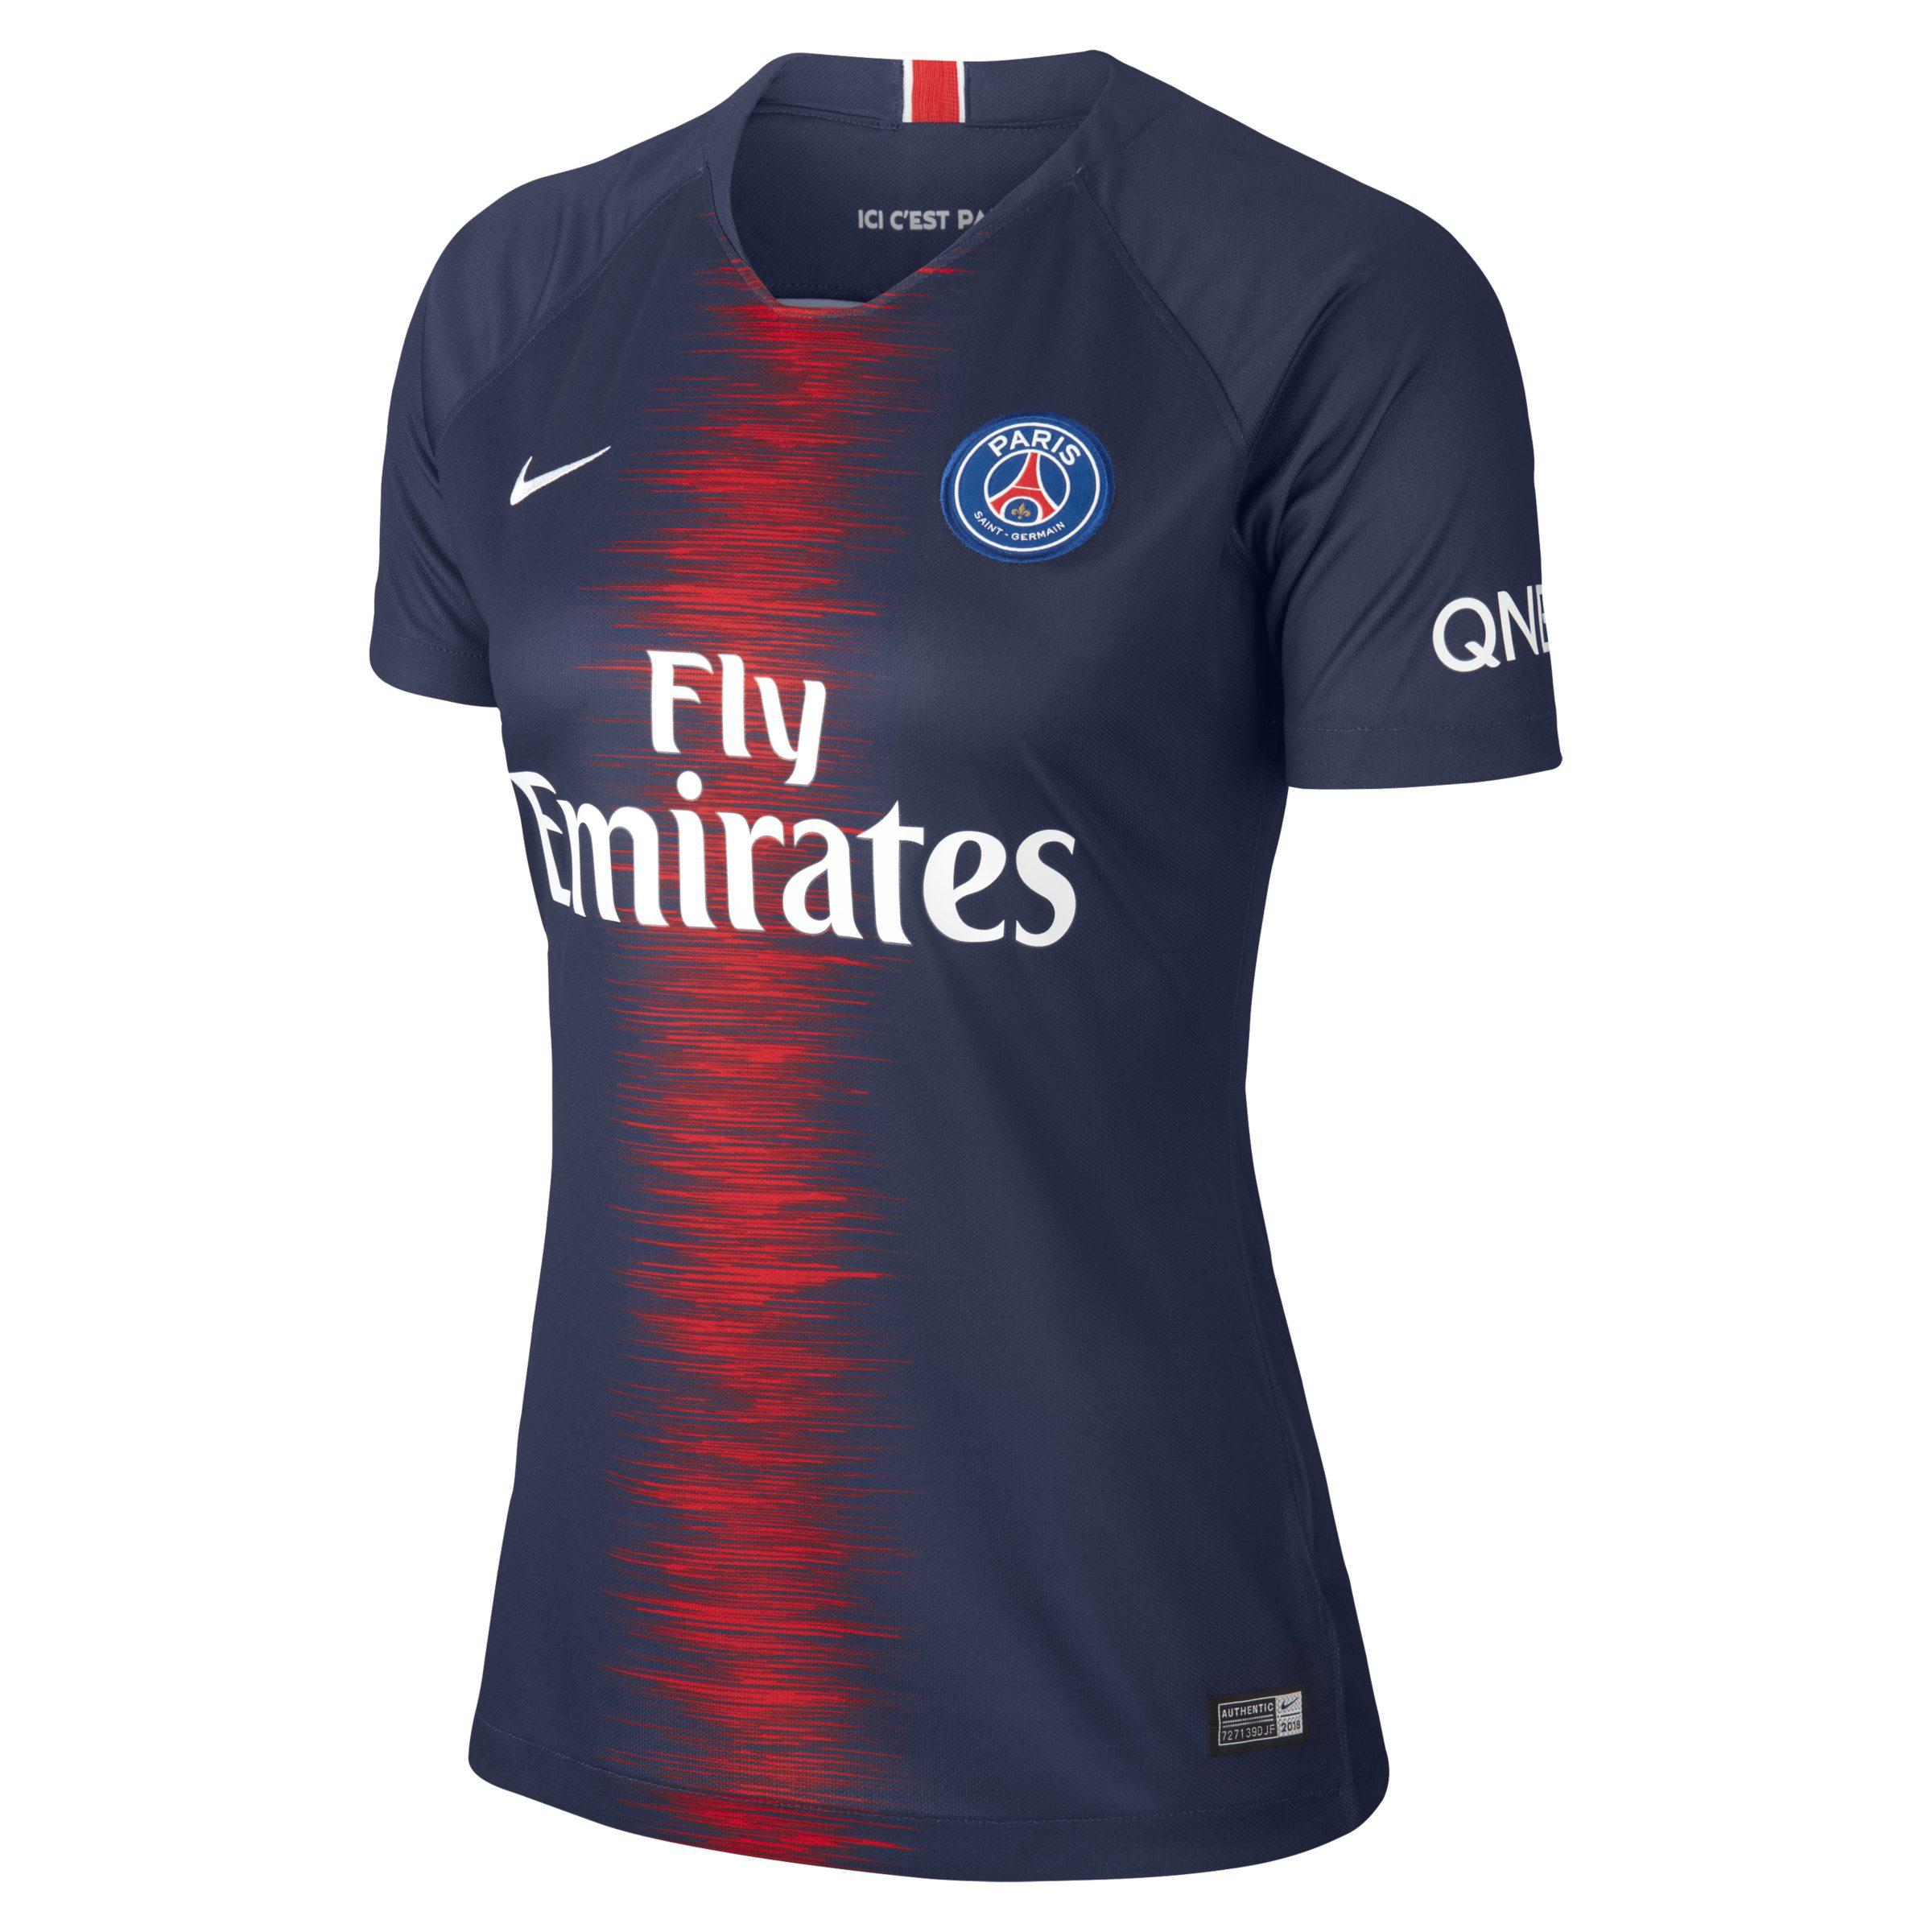 a28be80764792 Nike. Women s Blue 2018 19 Paris Saint-germain Stadium Home Football Shirt